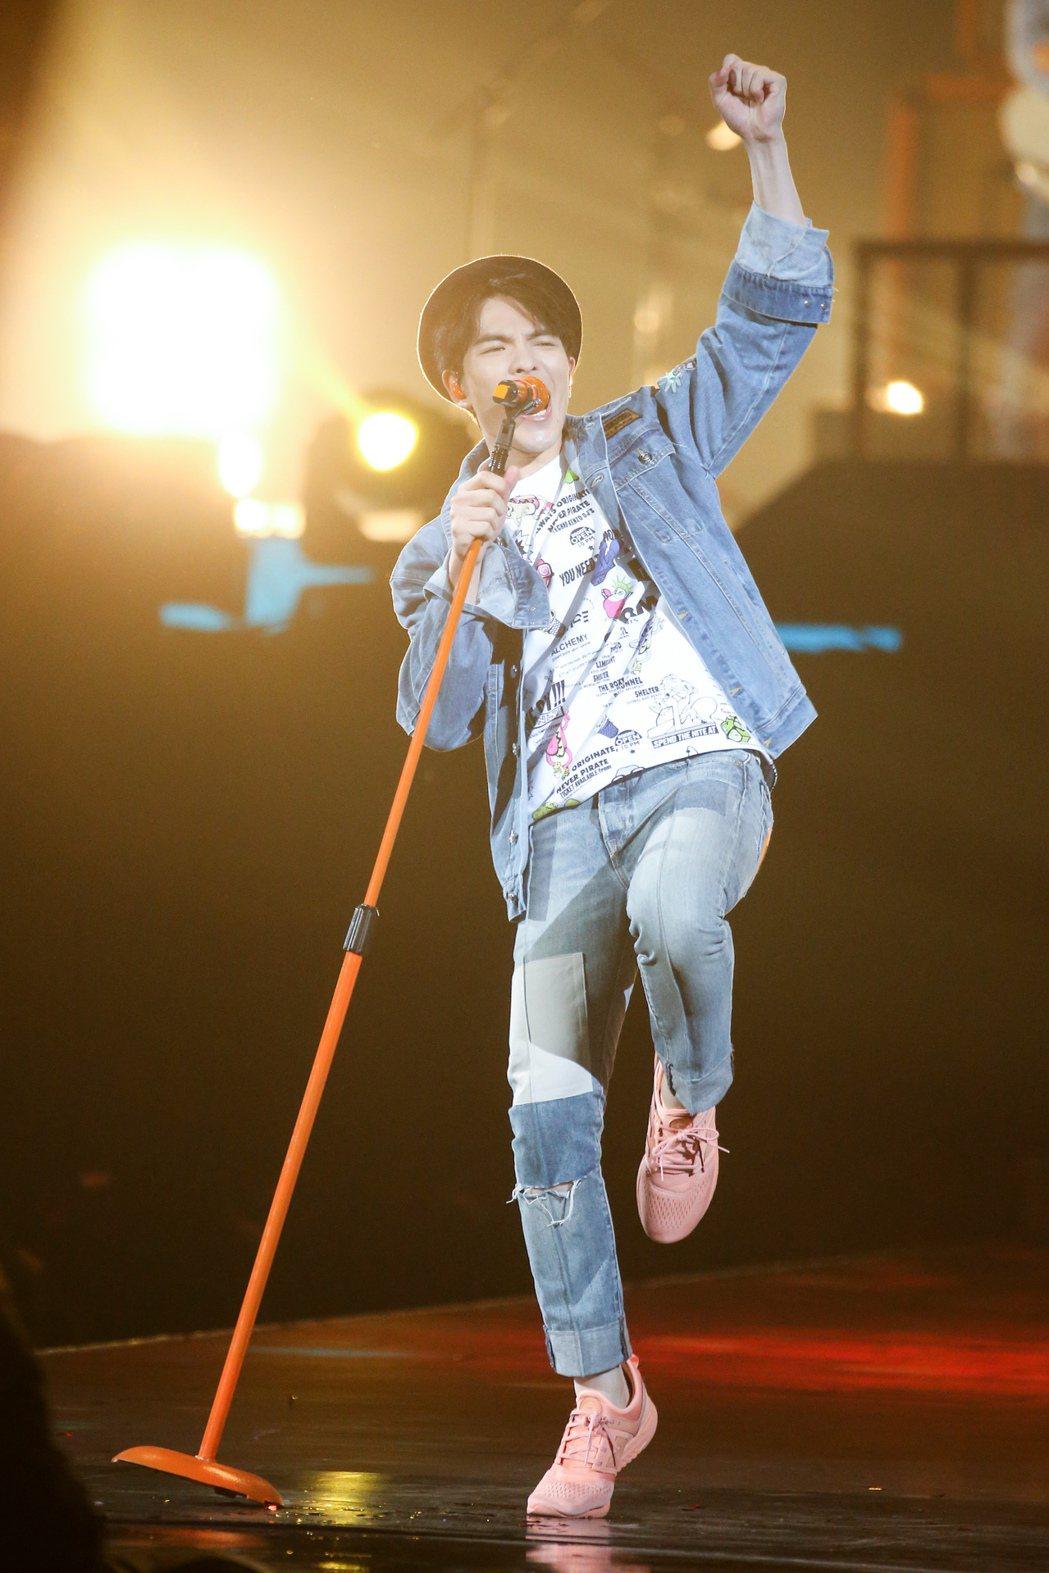 2017hito流行音樂獎頒獎典禮在台北小巨蛋舉行,最受歡迎樂團得主獅子合唱團表...